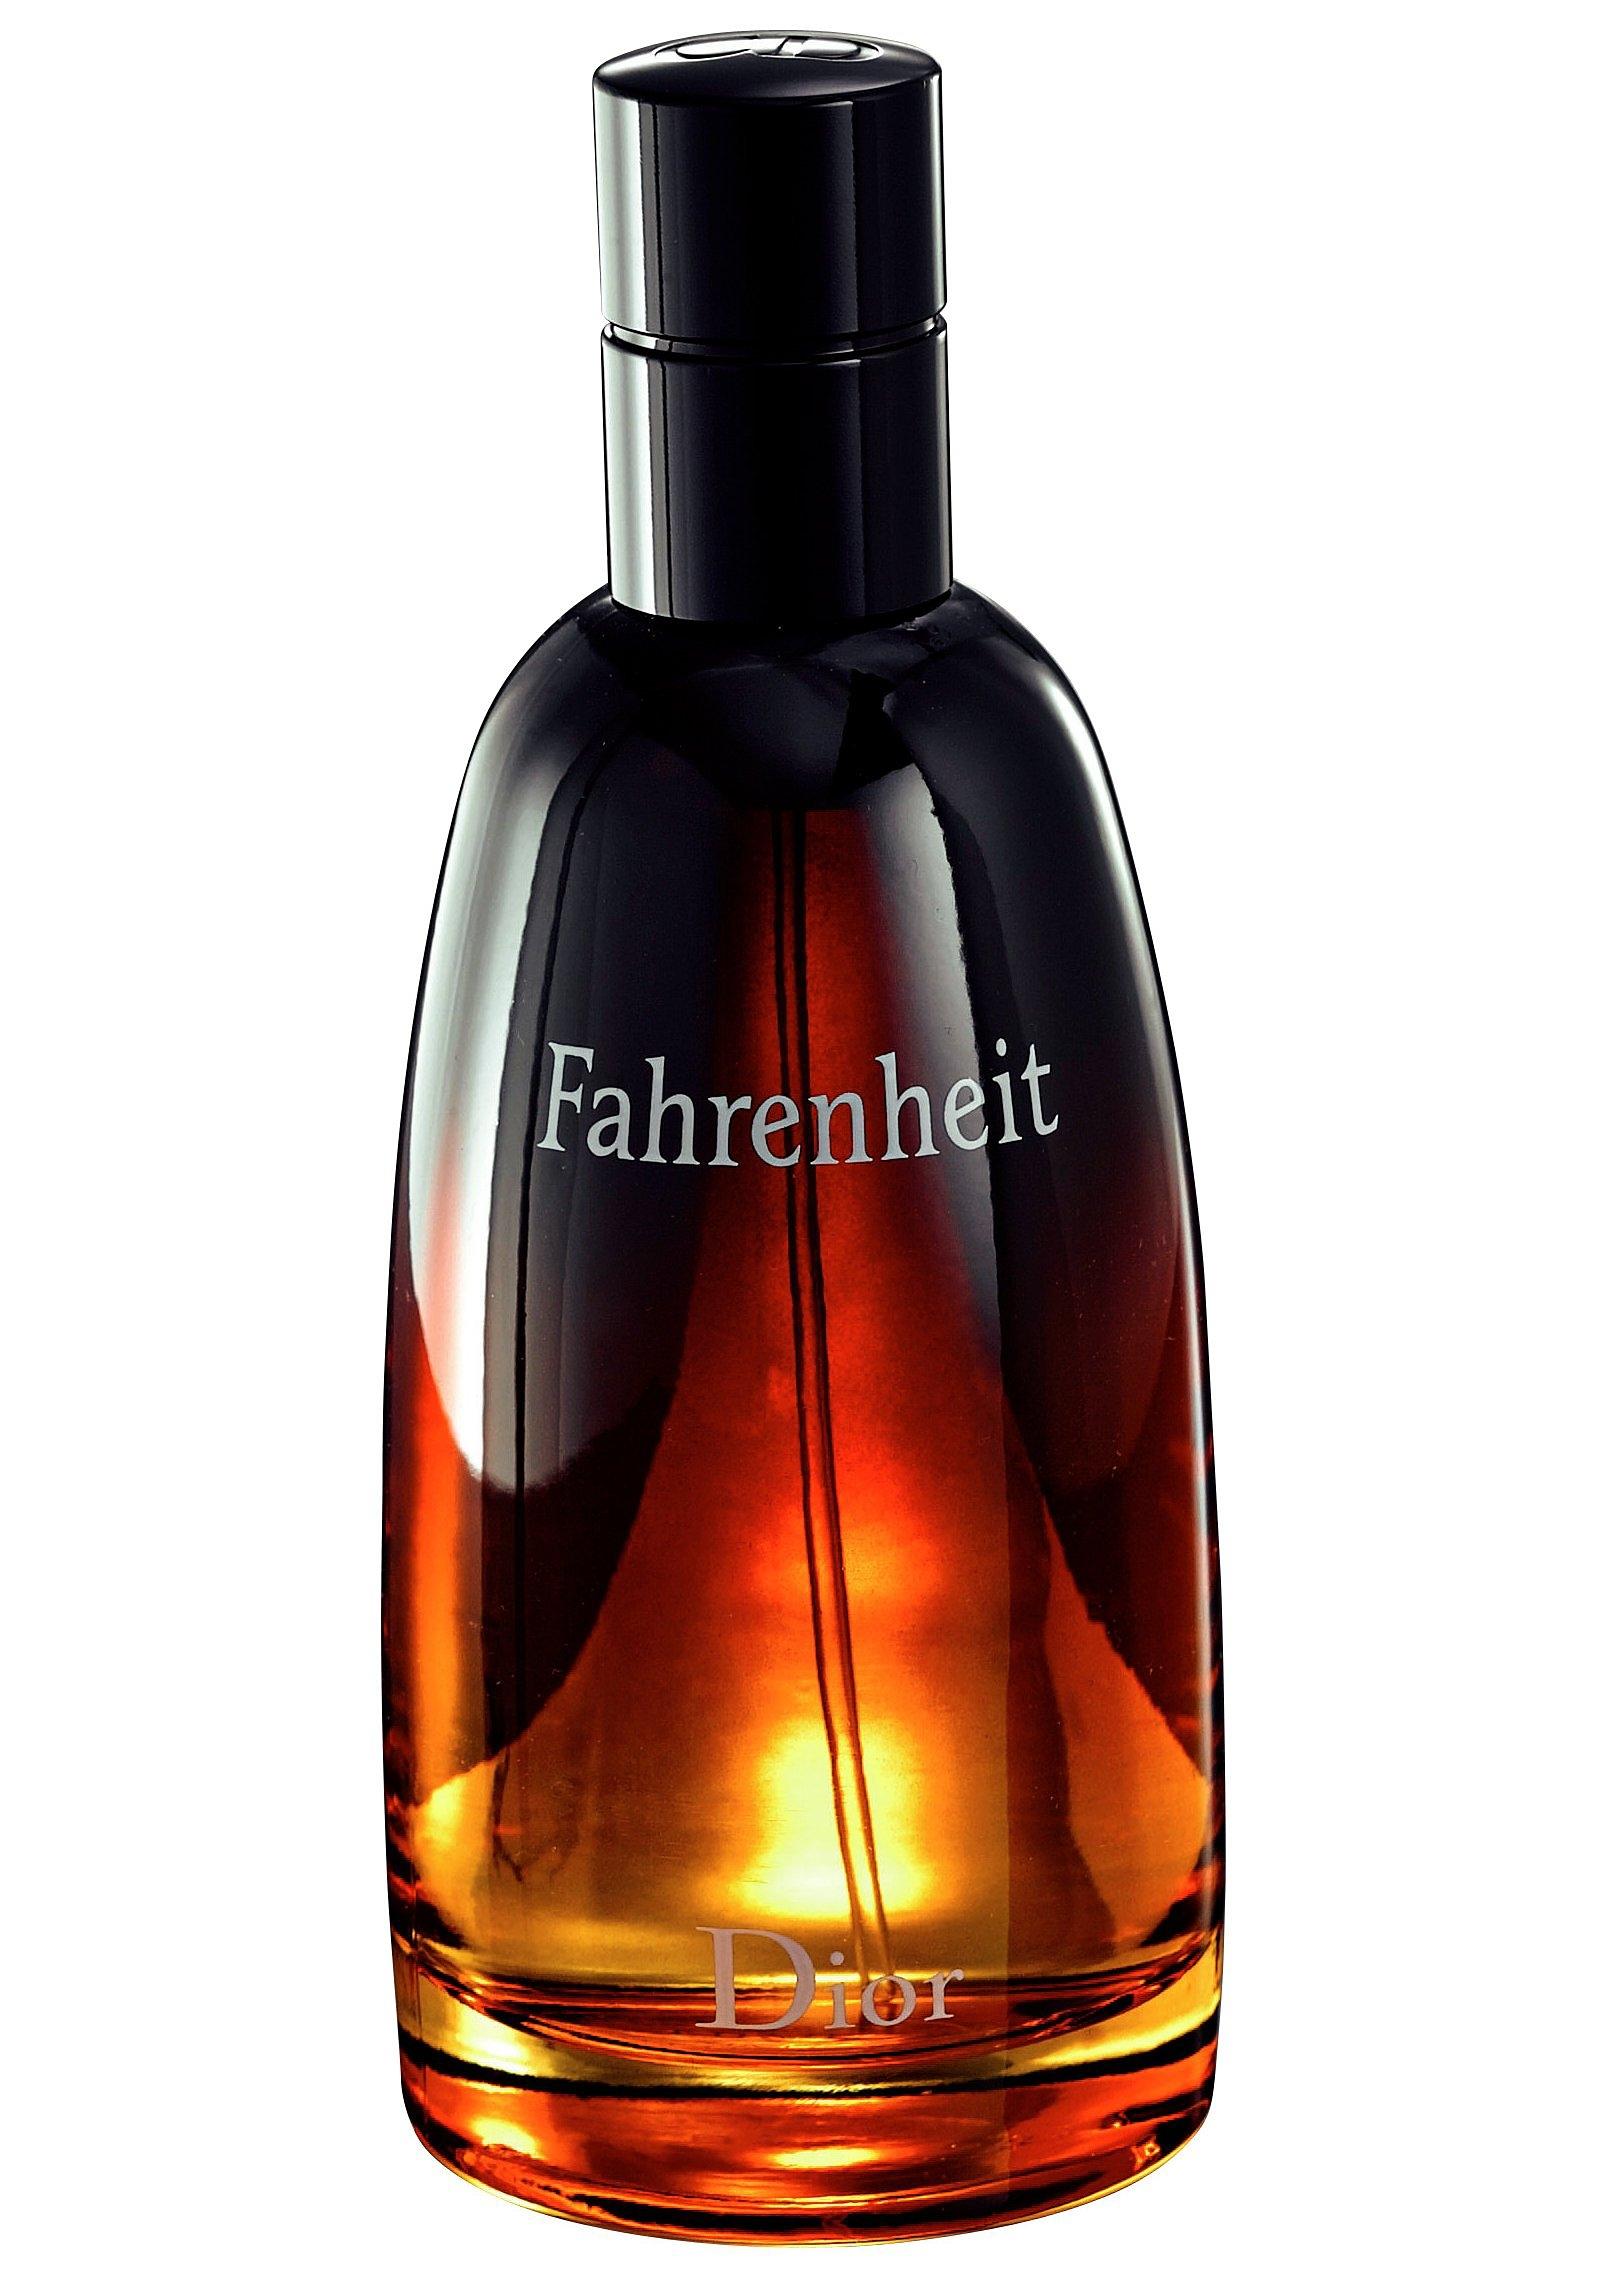 Dior »Fahrenheit« aftershave in de webshop van OTTO kopen